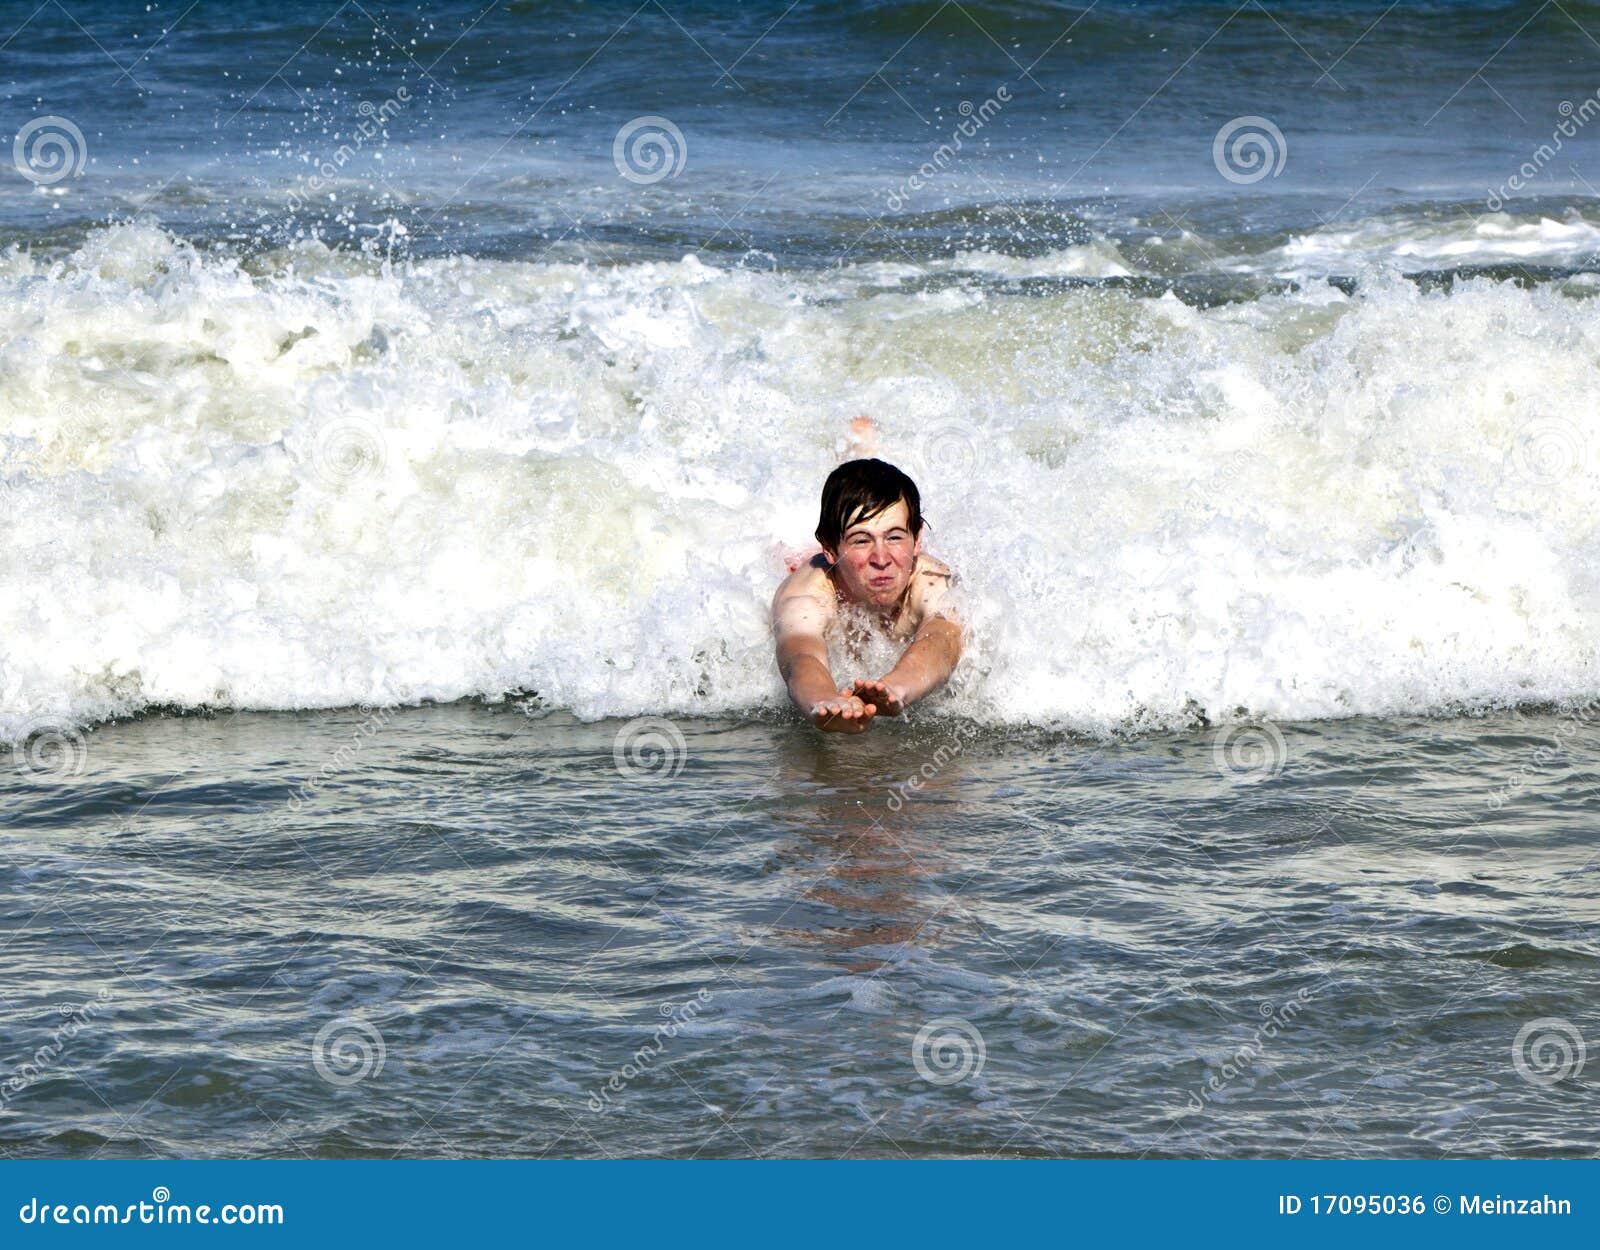 Junger Junge ist die Karosserie, die in die Wellen surft